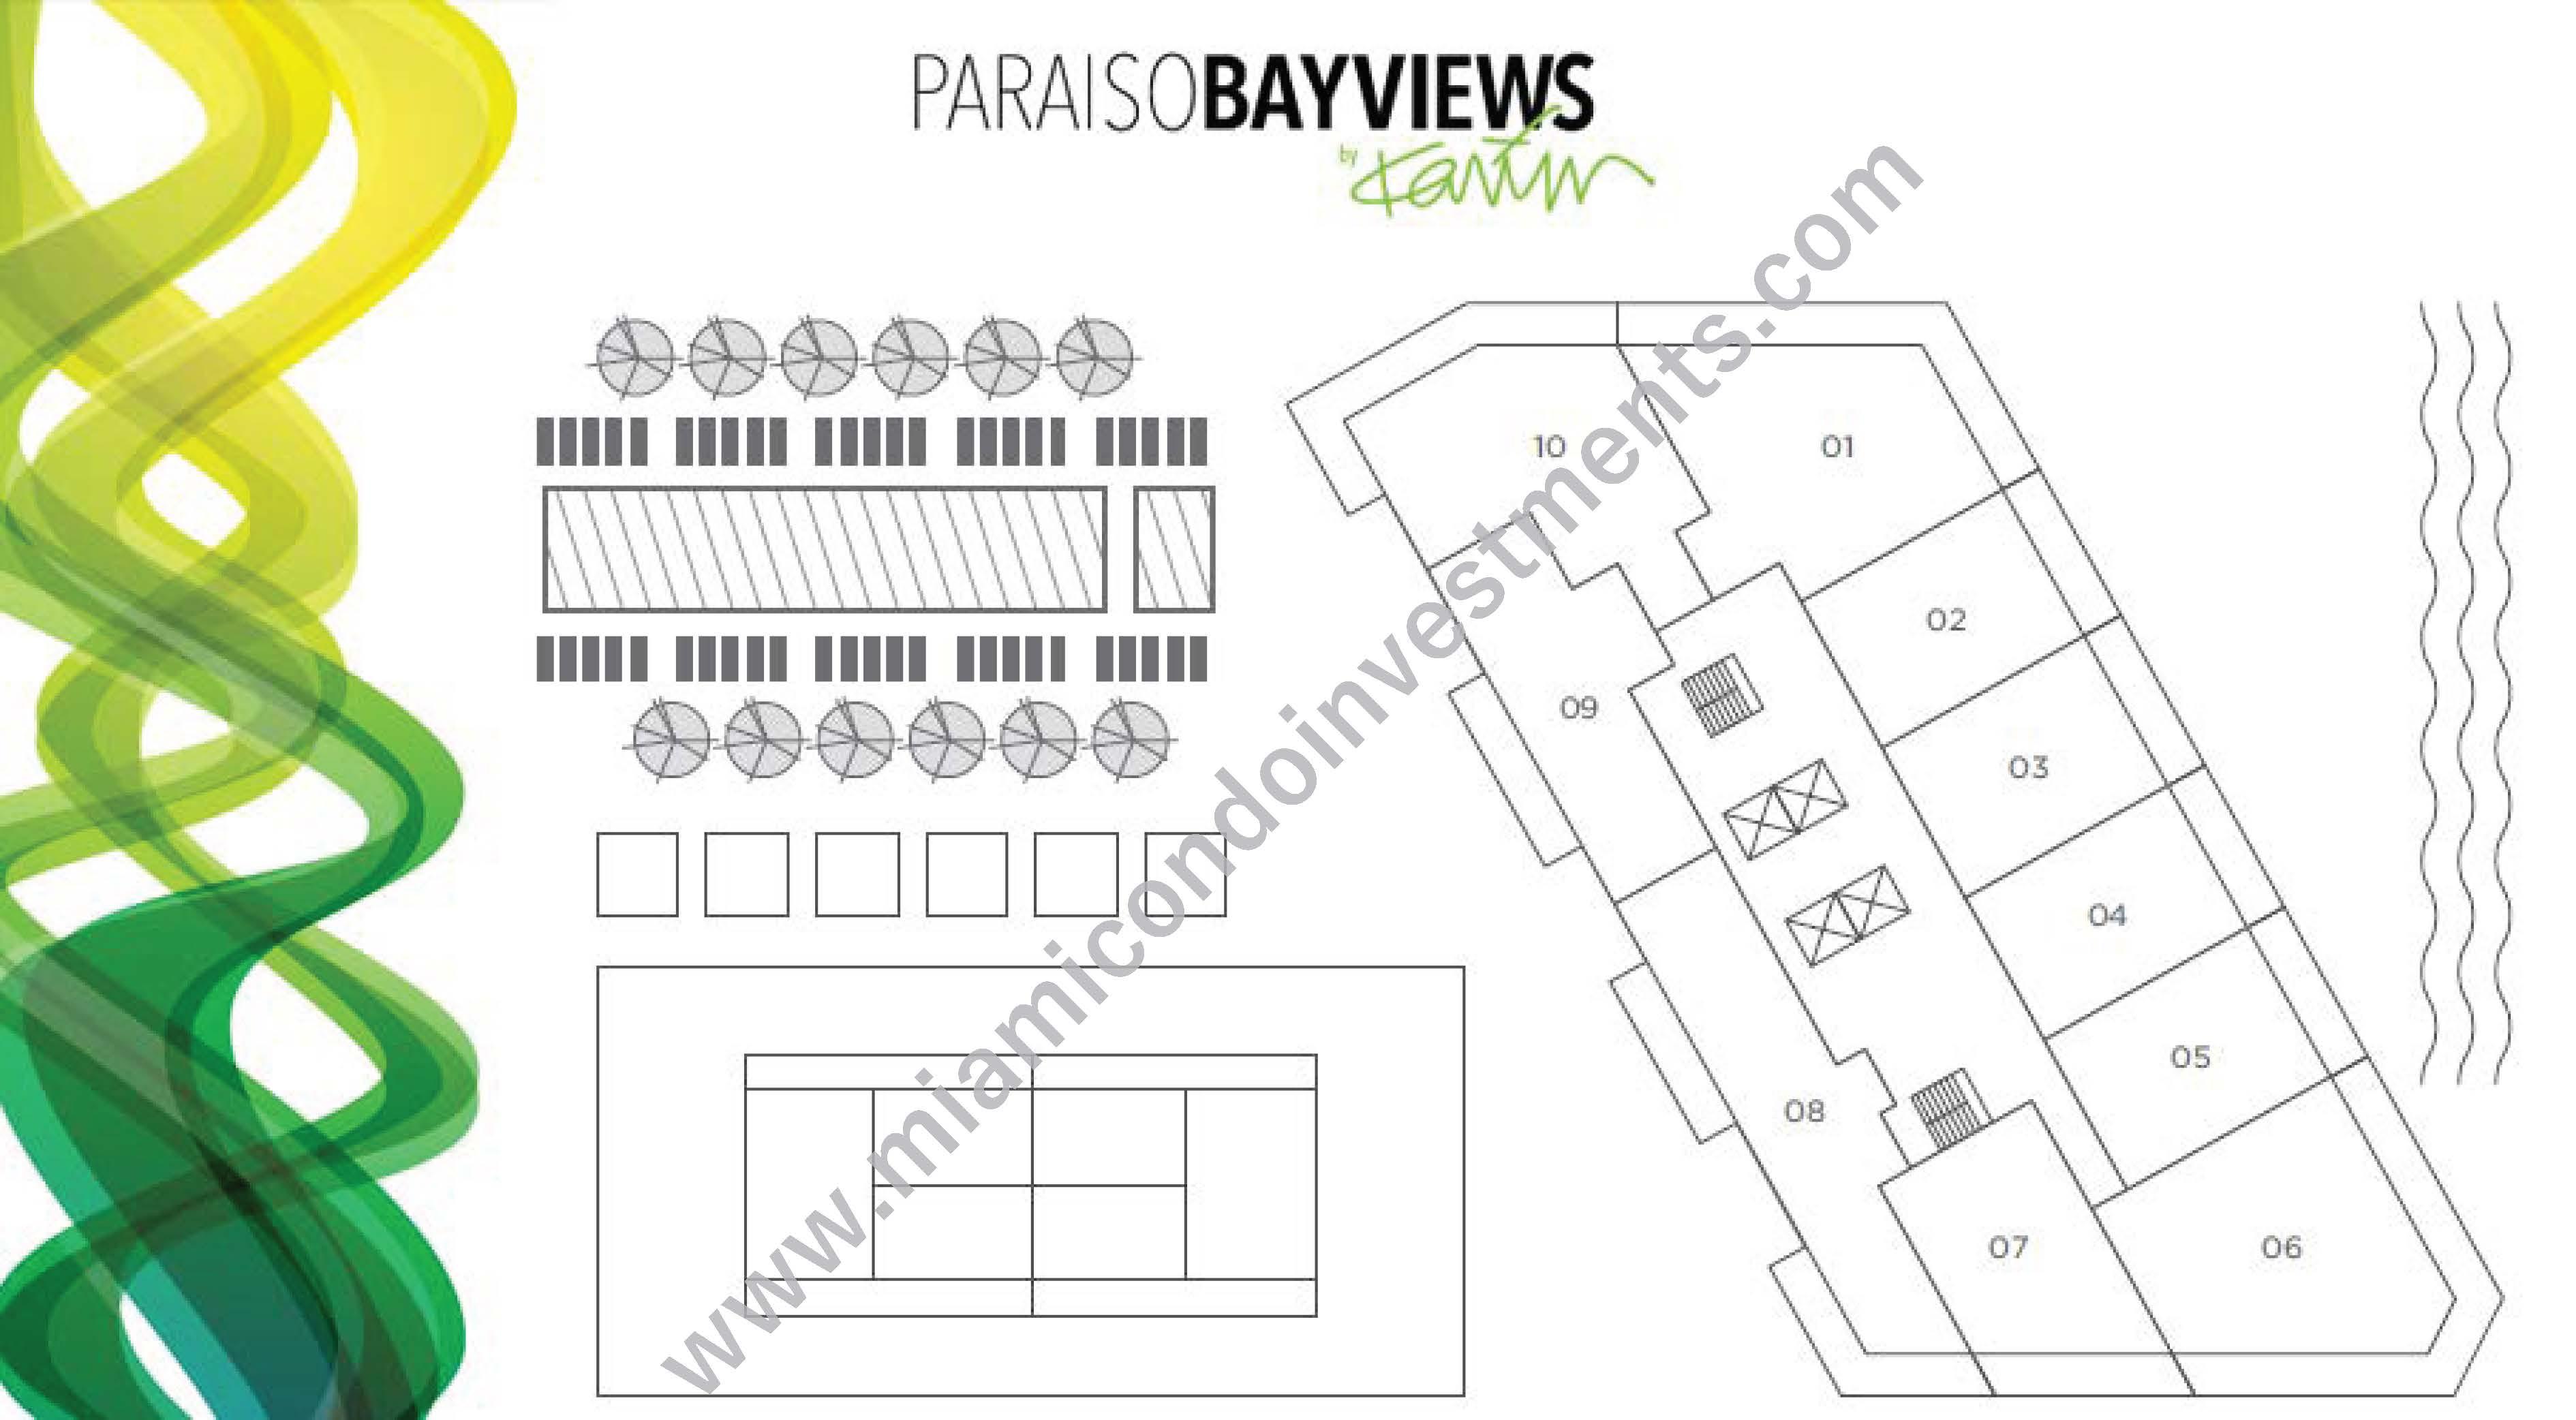 paraiso-bayviews-key-plan